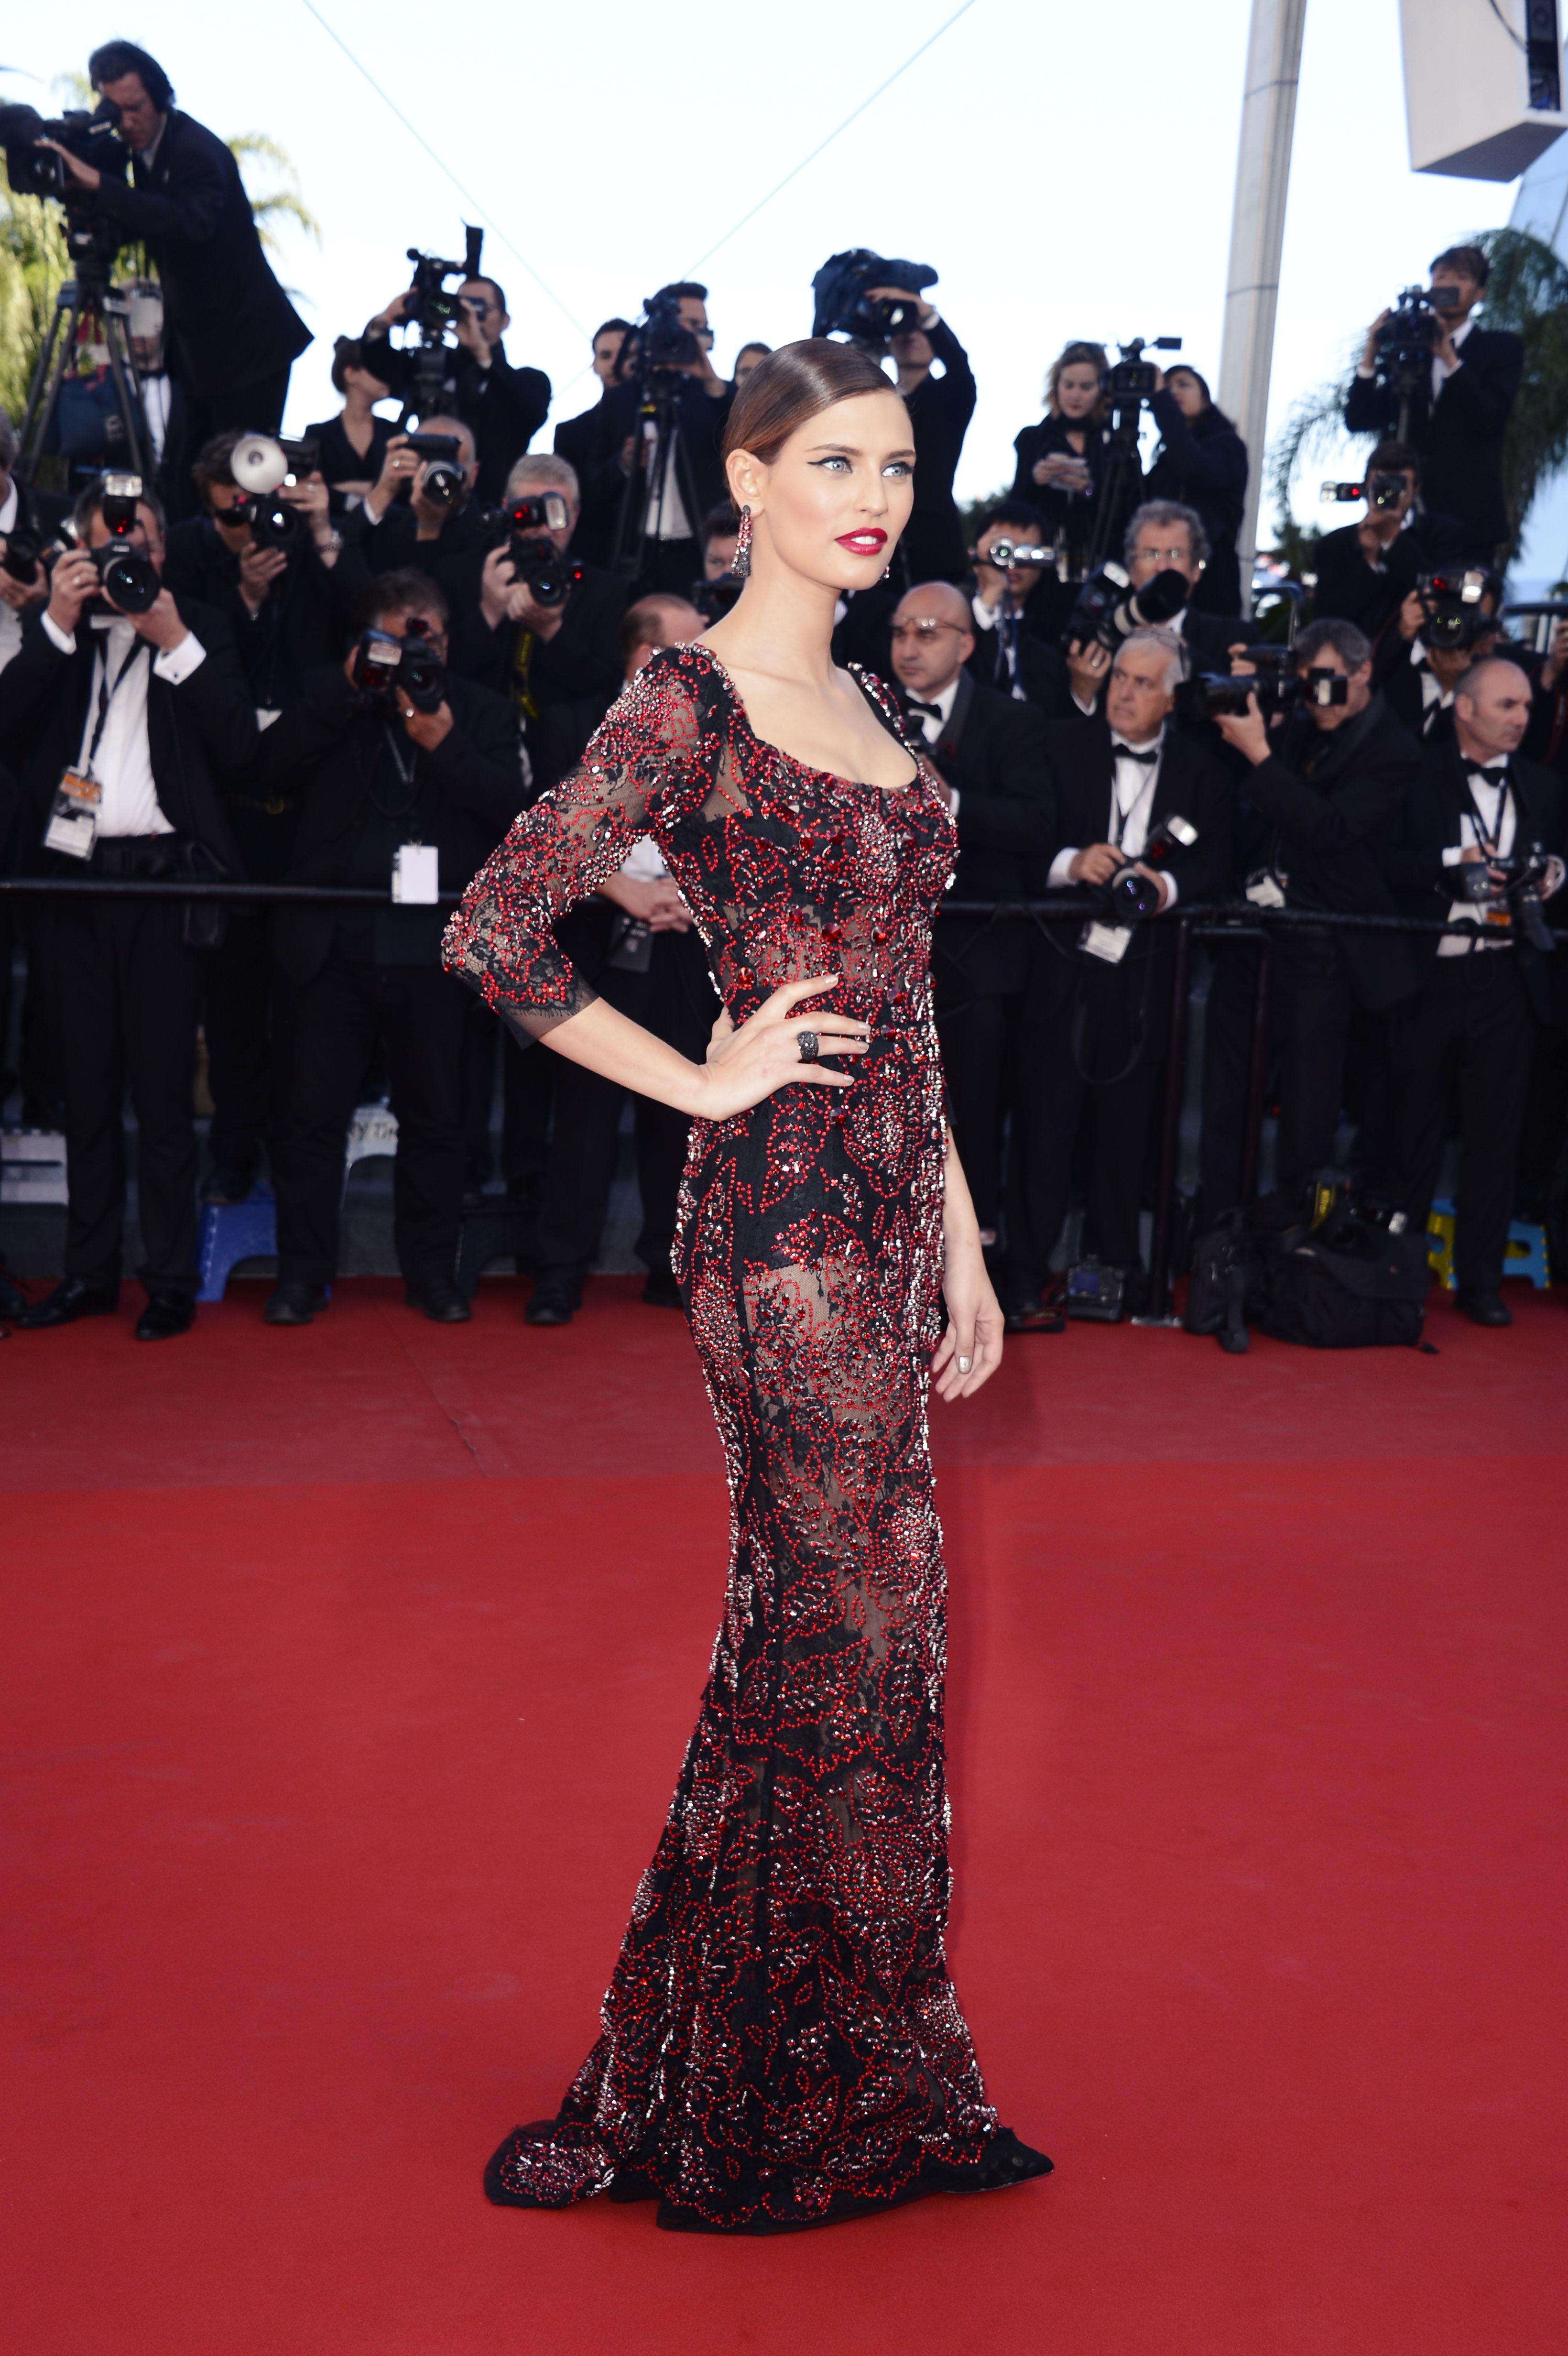 #BiancaBalti #Cannes2013 #LorealParis